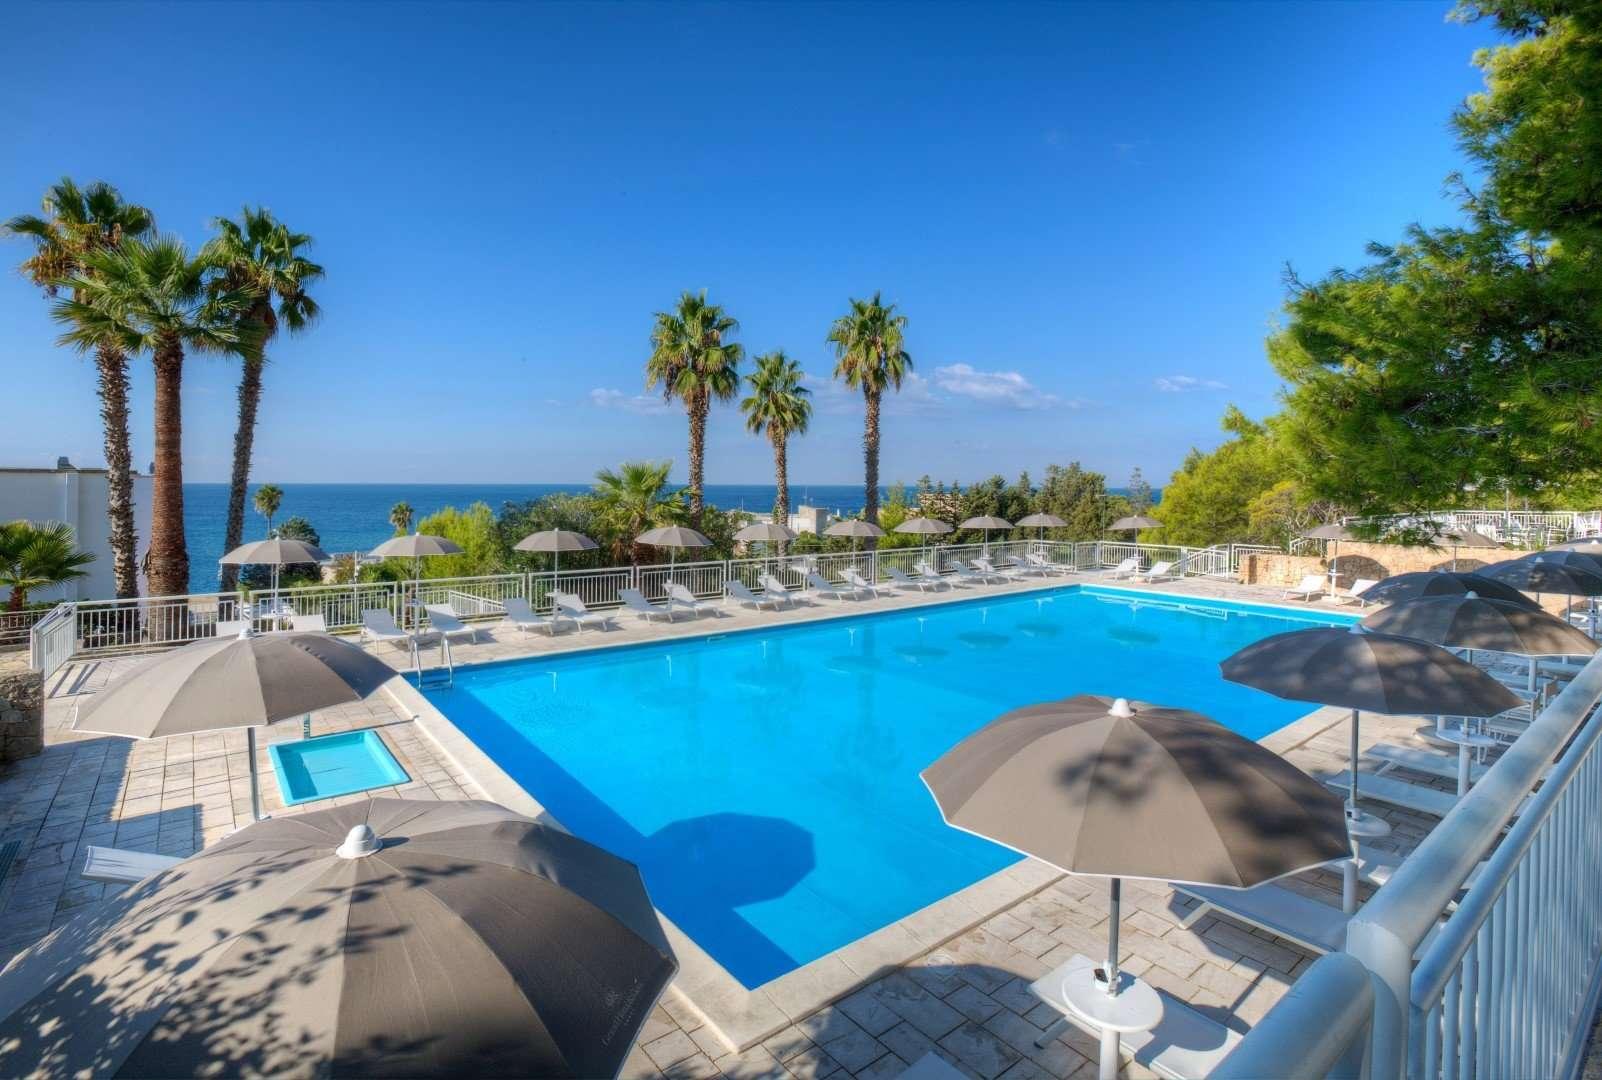 grand hotel riviera - puglia - italie - zwembad